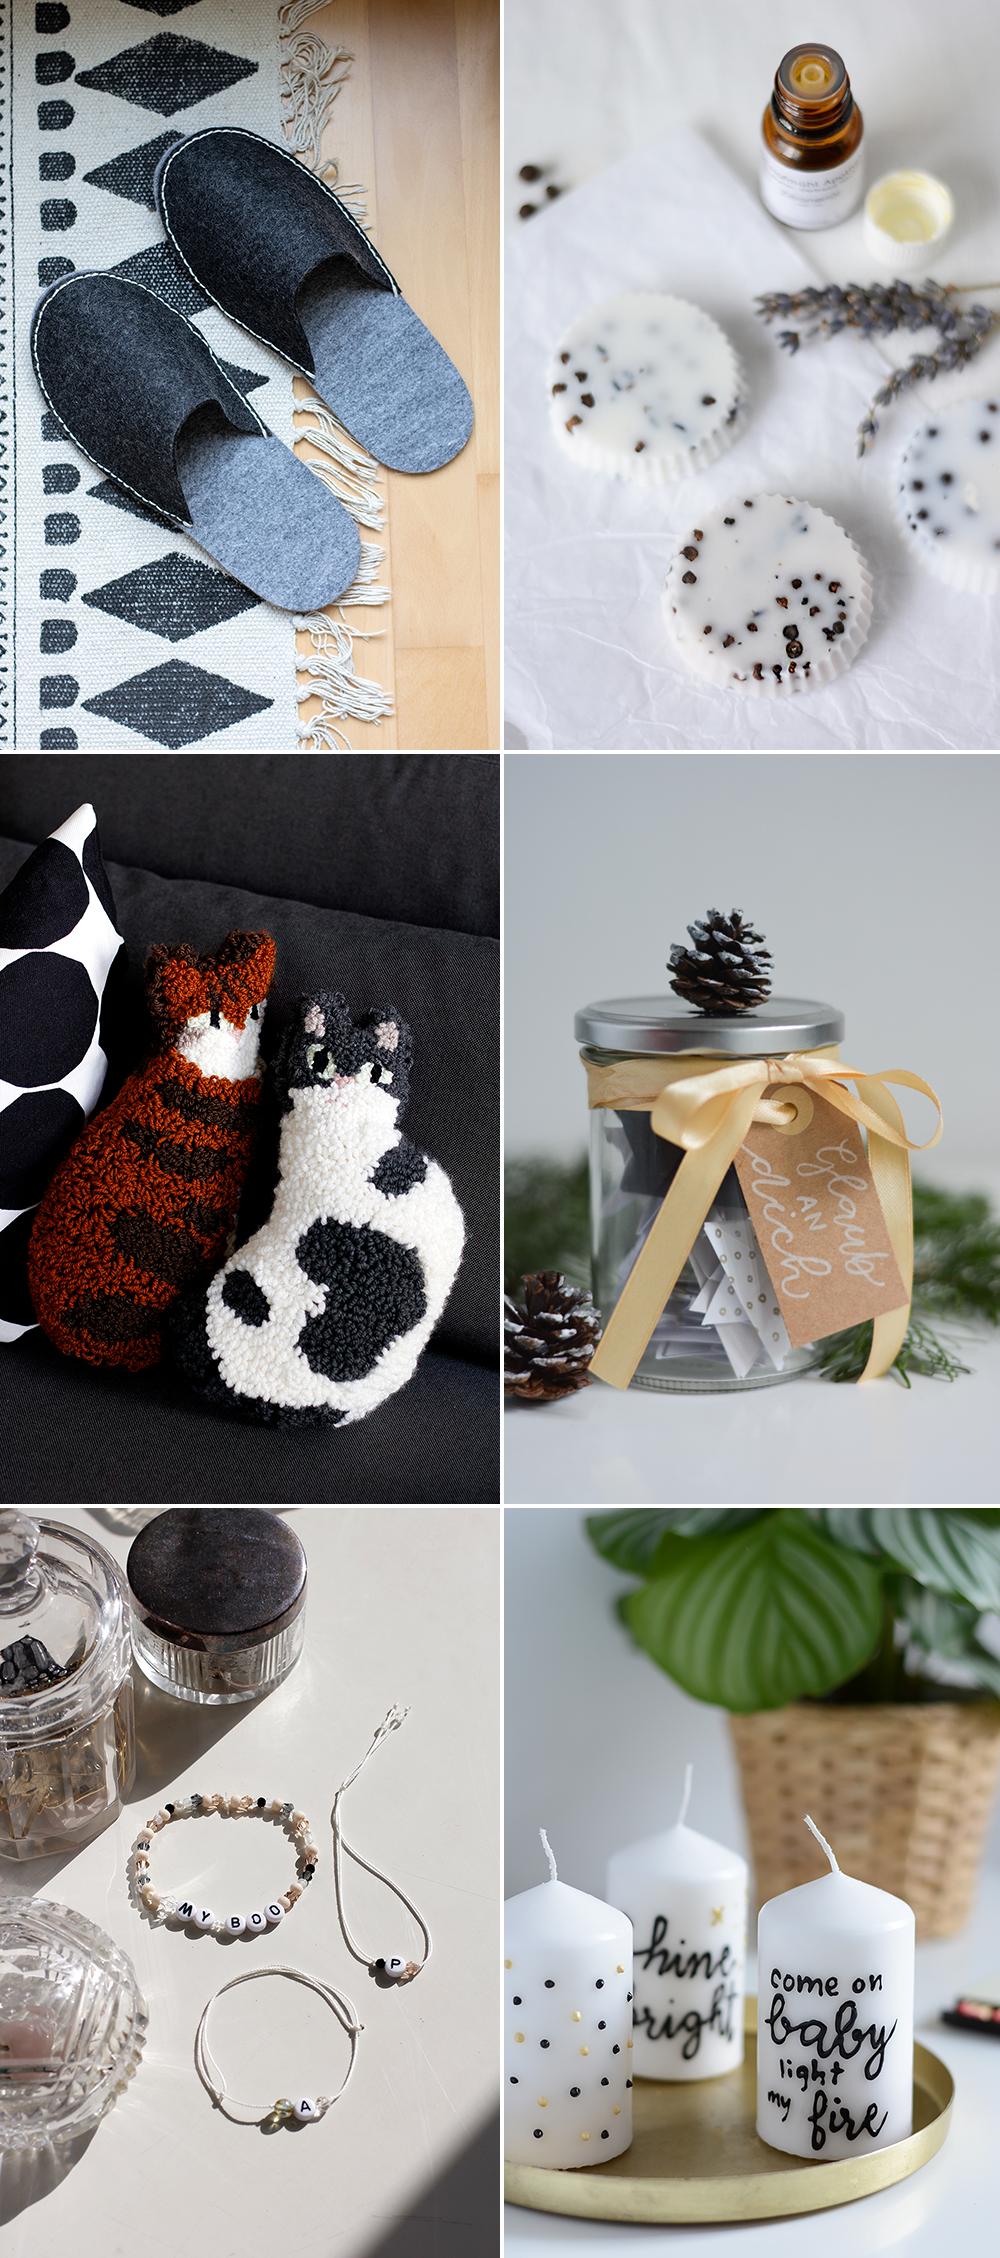 Personalisierte DIY-Geschenke   we love handmade